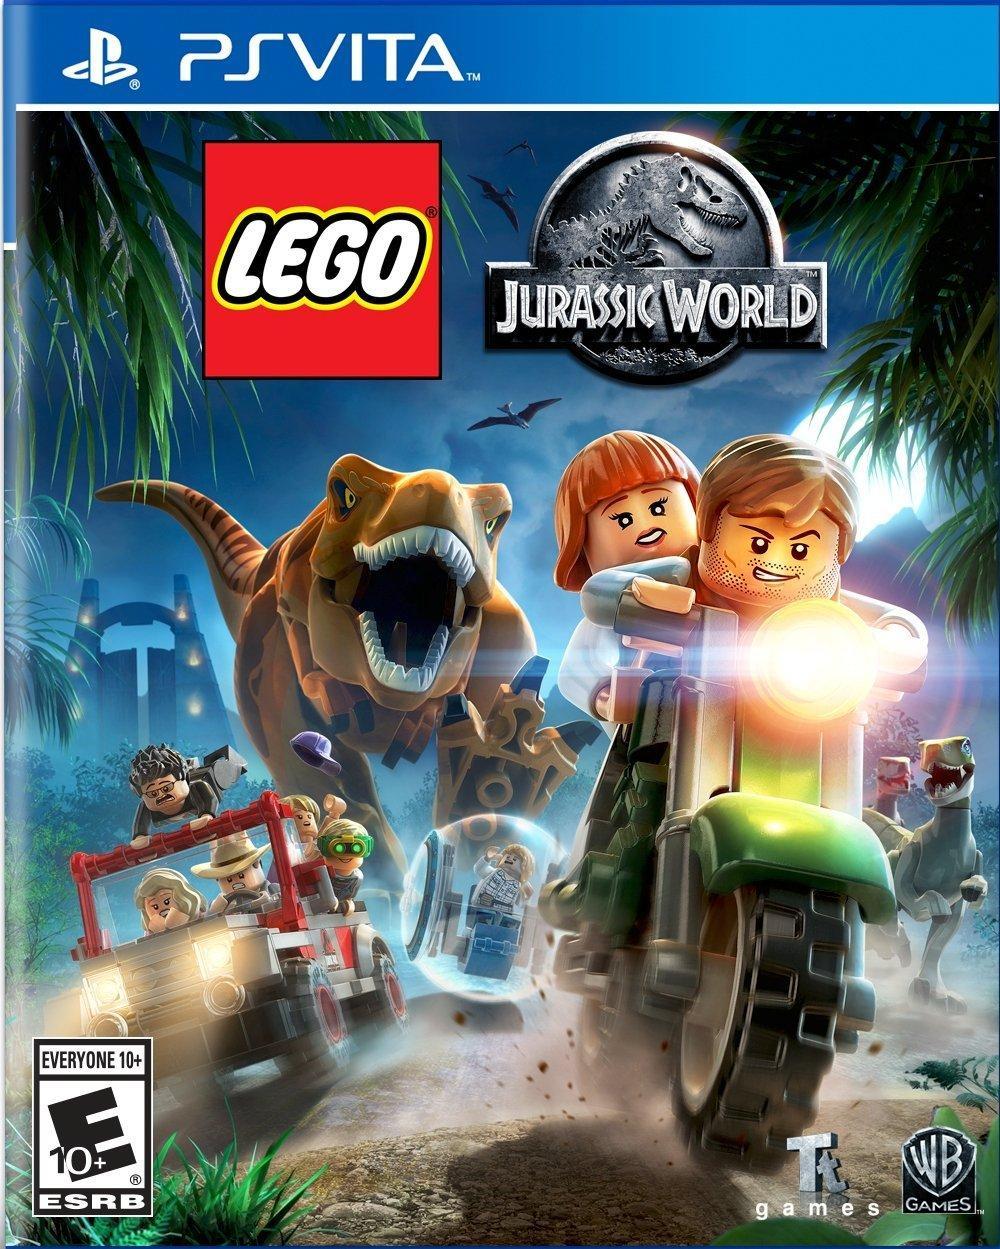 LEGO Jurassic World (з російськими субтитрами) PS VITA